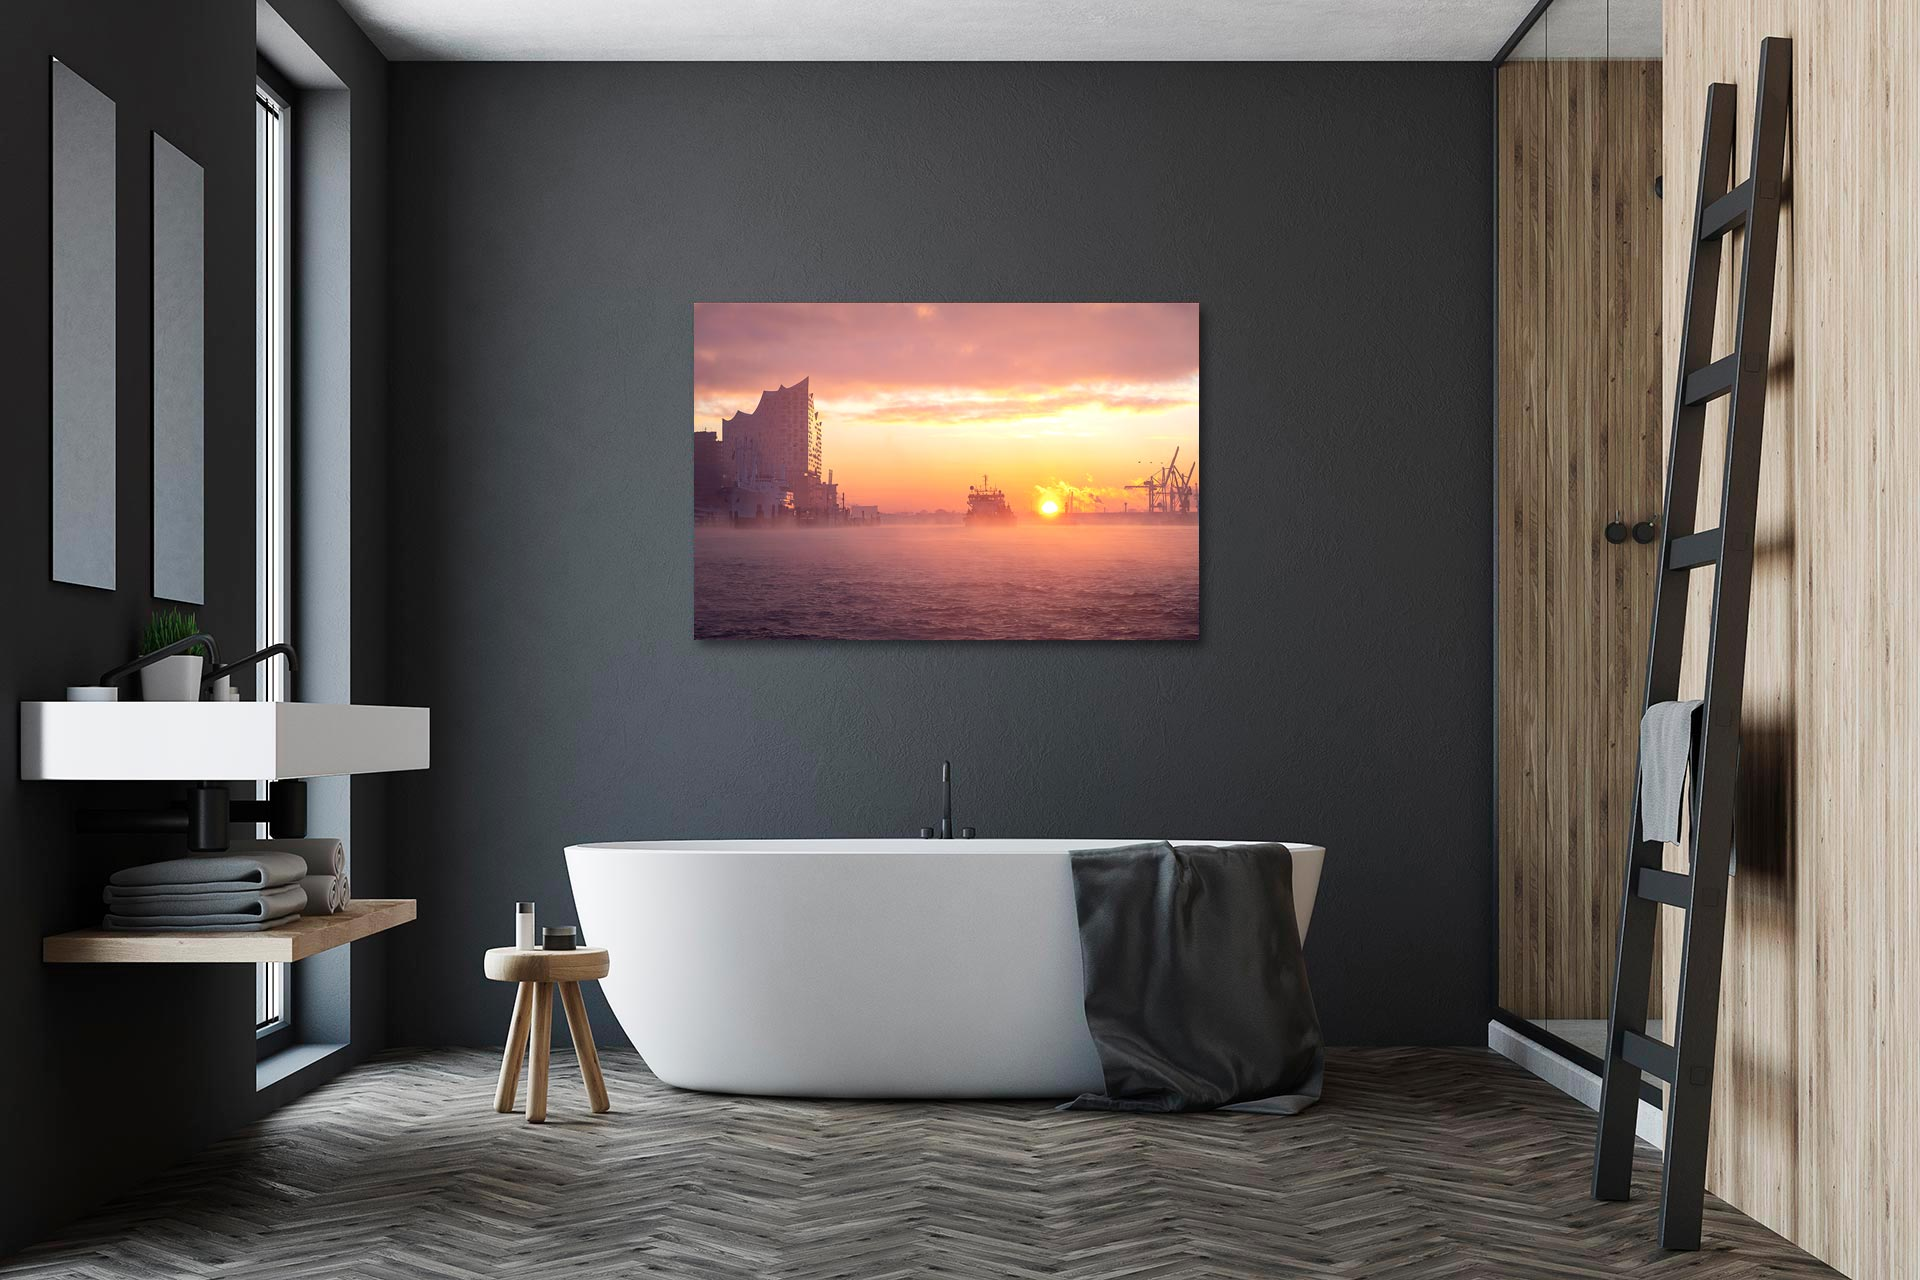 LCW290-wintersonne-wandbild-bild-auf-leinwand-acrylglas-aludibond-badezimmer